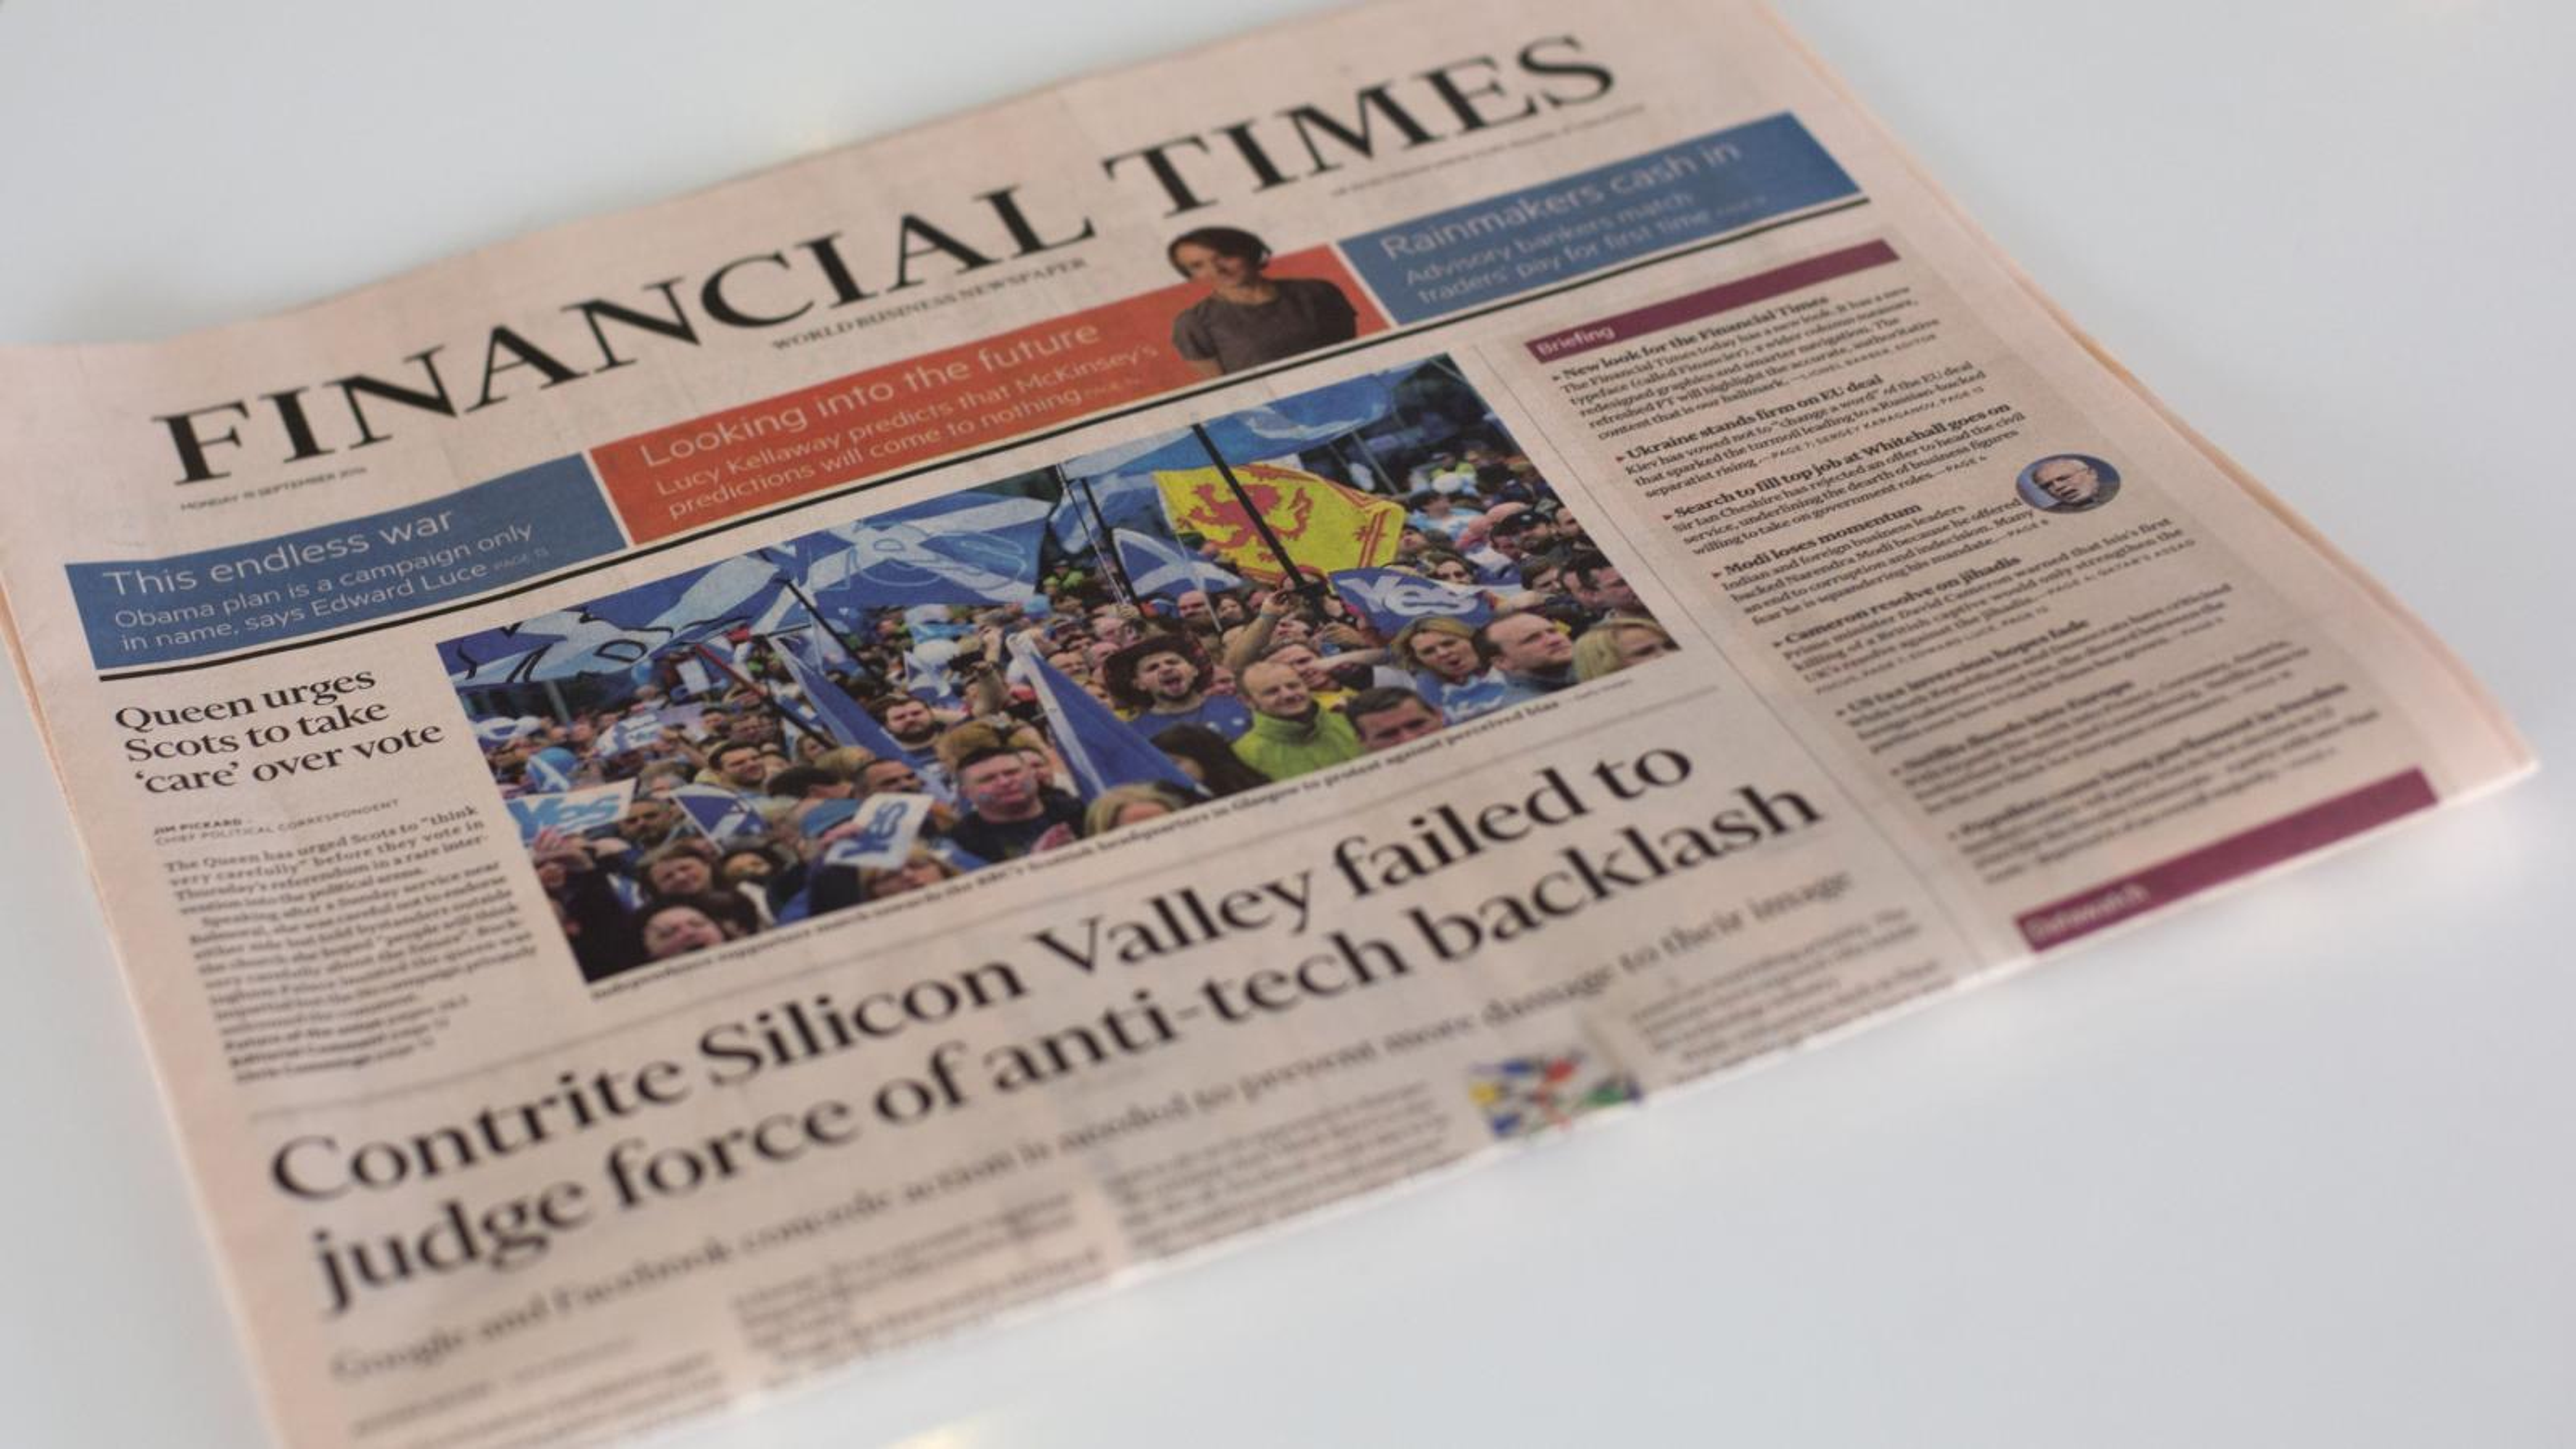 The Financial Times reboots print even as readers flock to digital — Quartz